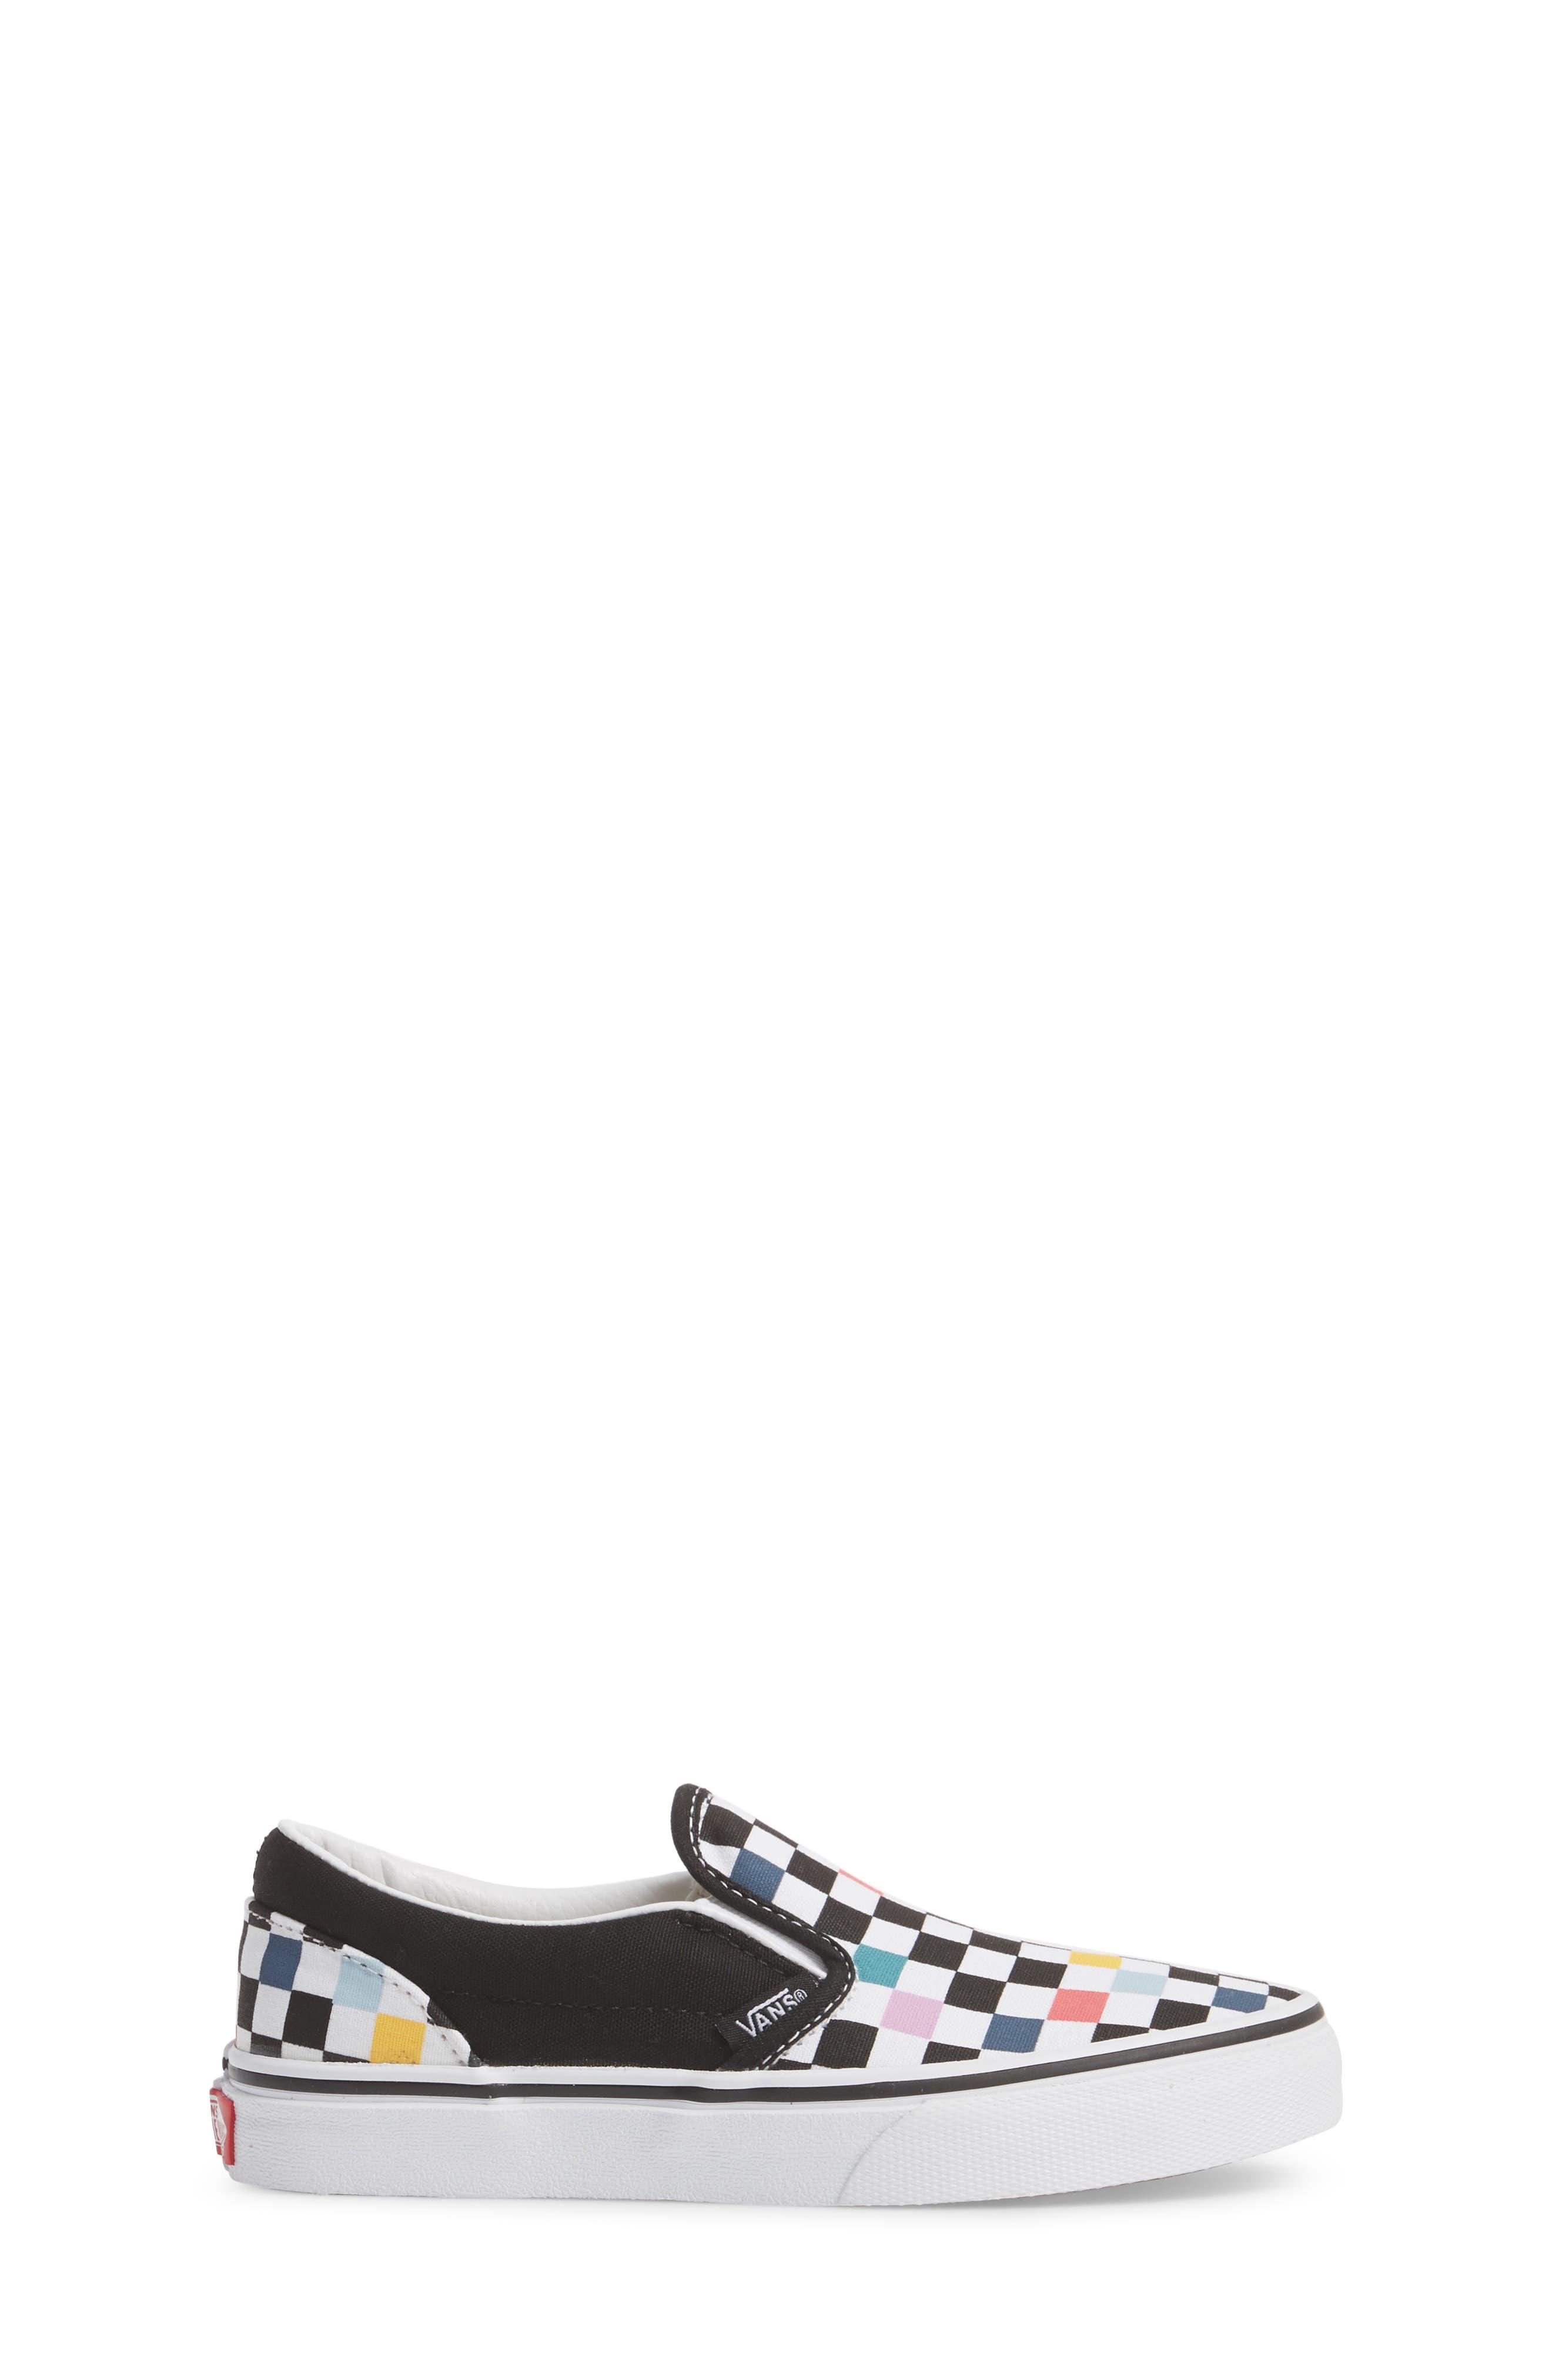 Party Check Slip-On Sneaker,                             Alternate thumbnail 3, color,                             Party Checker Multi/ Black